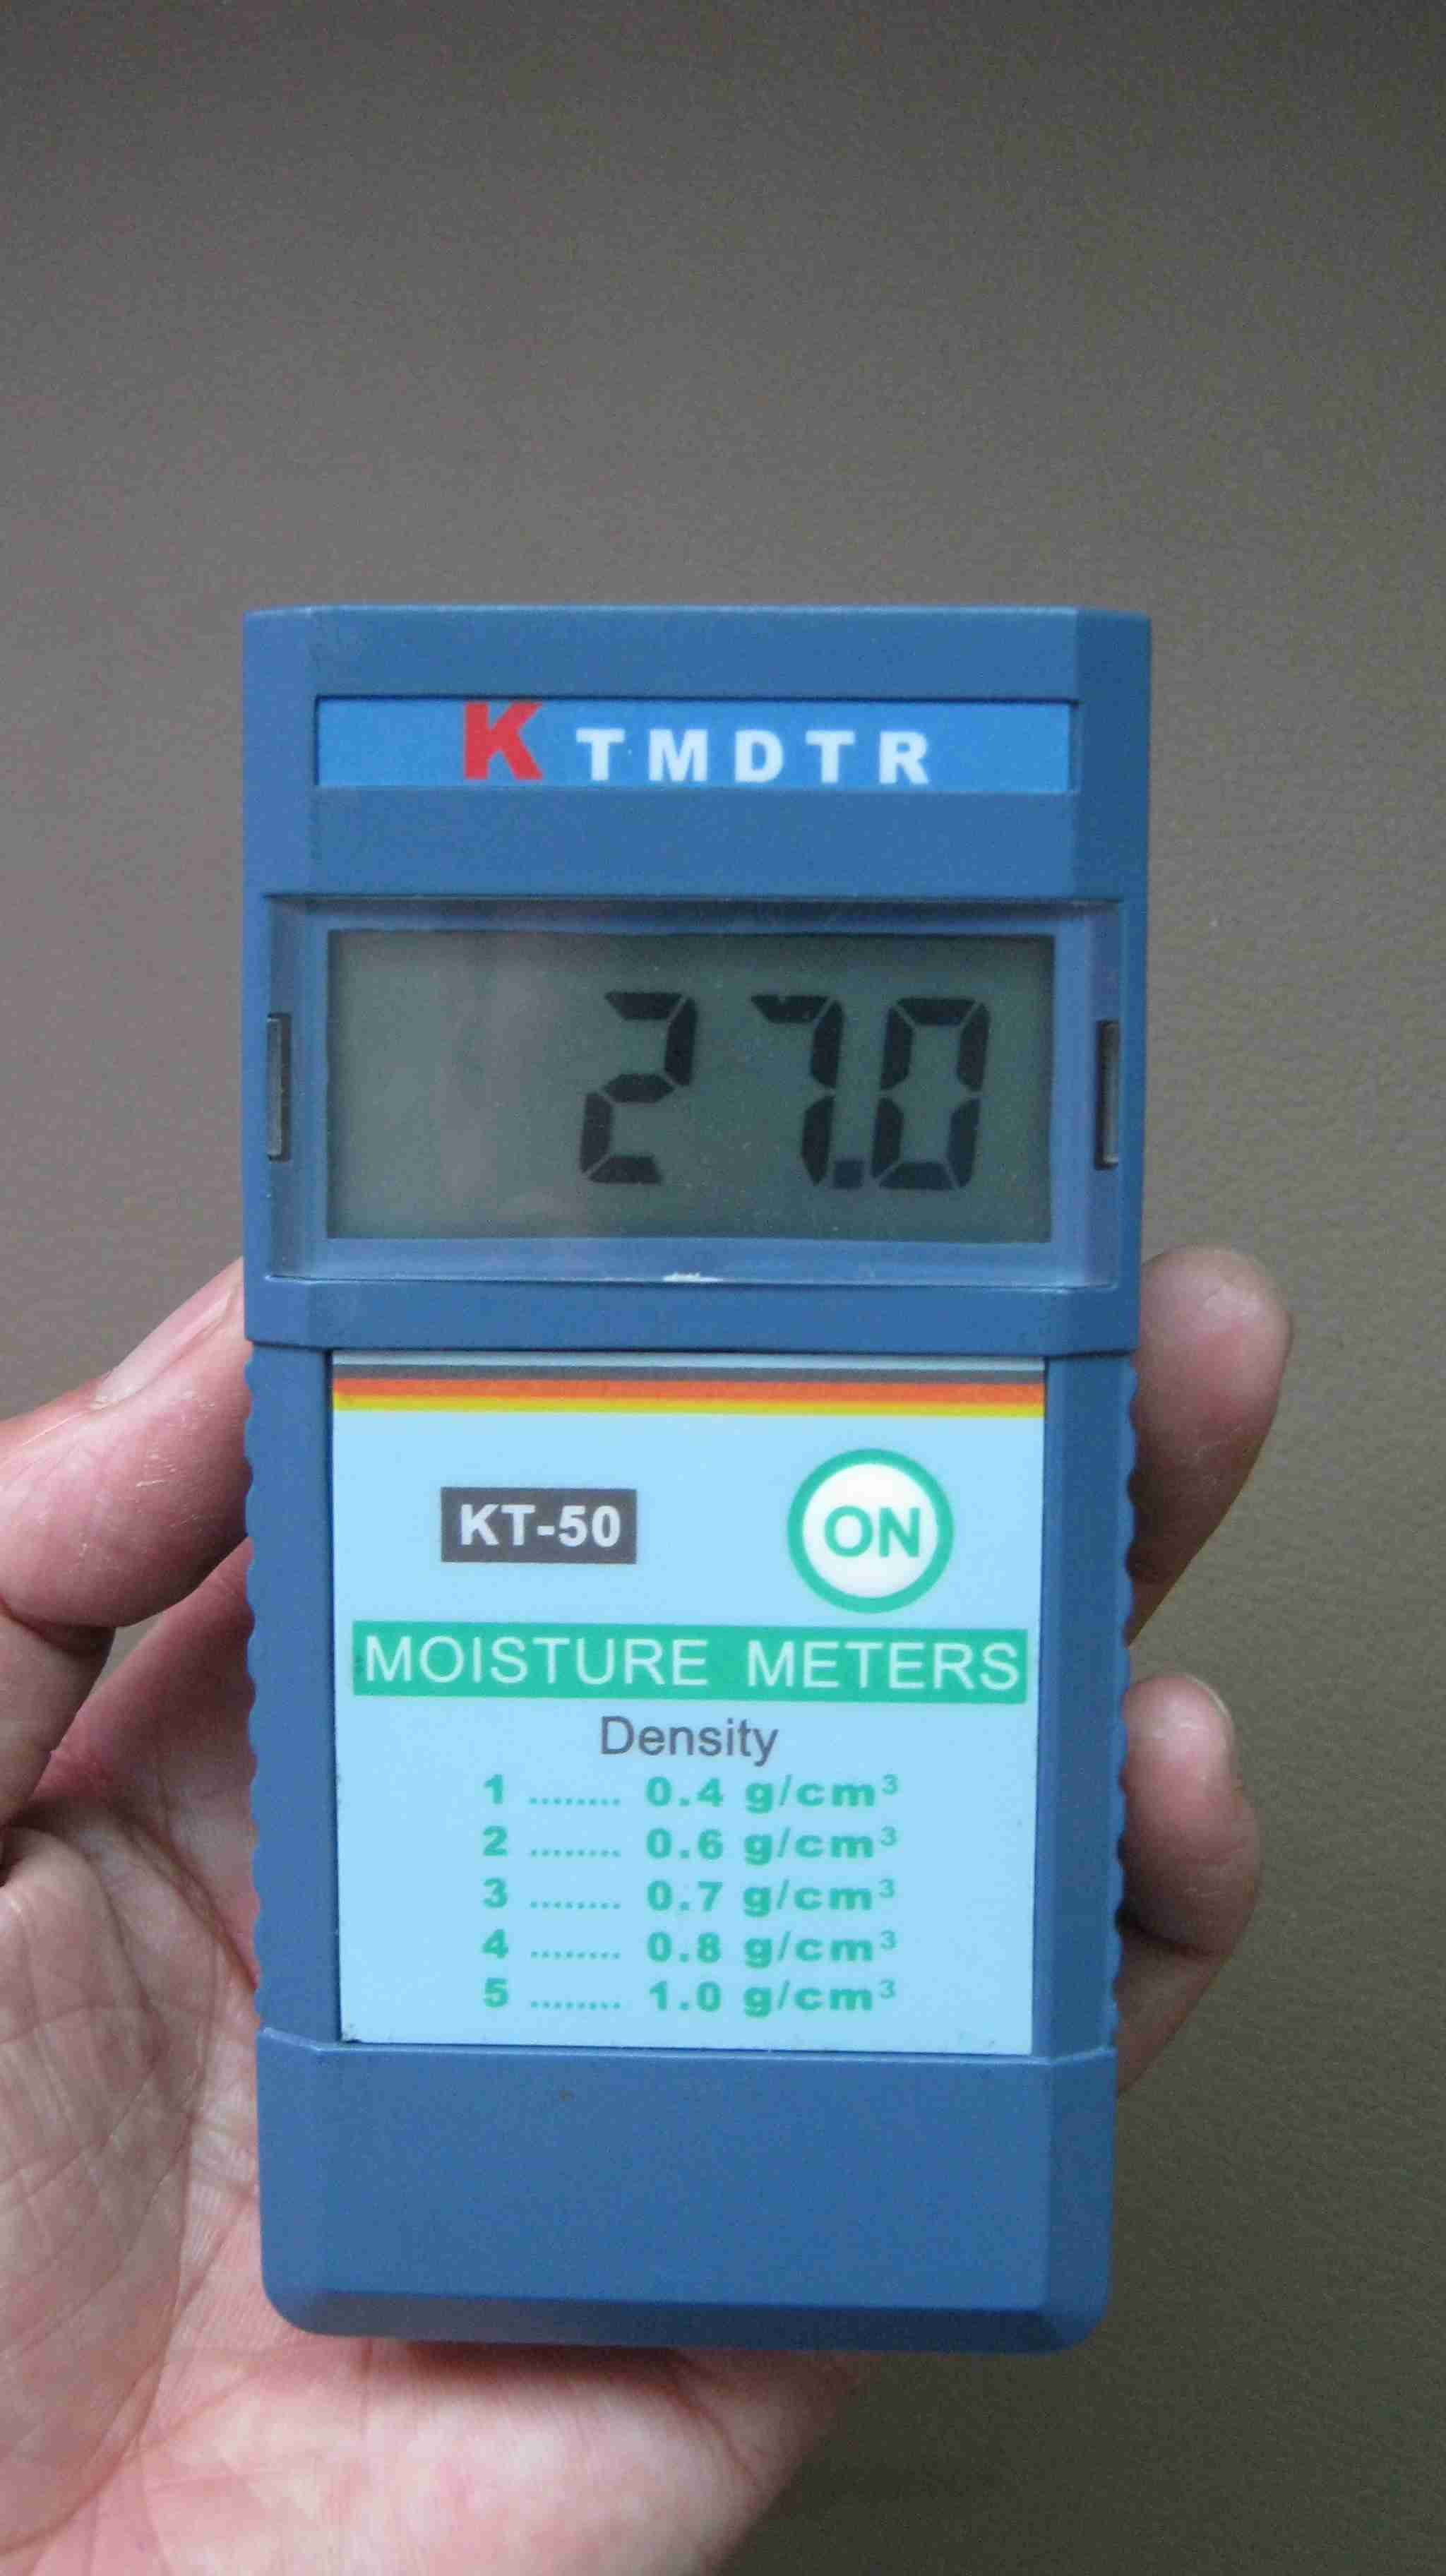 INDUCTIVE MOISTURE METER digital wood moisture meter KT 50 2 90 Resolution 1 free shipping retali